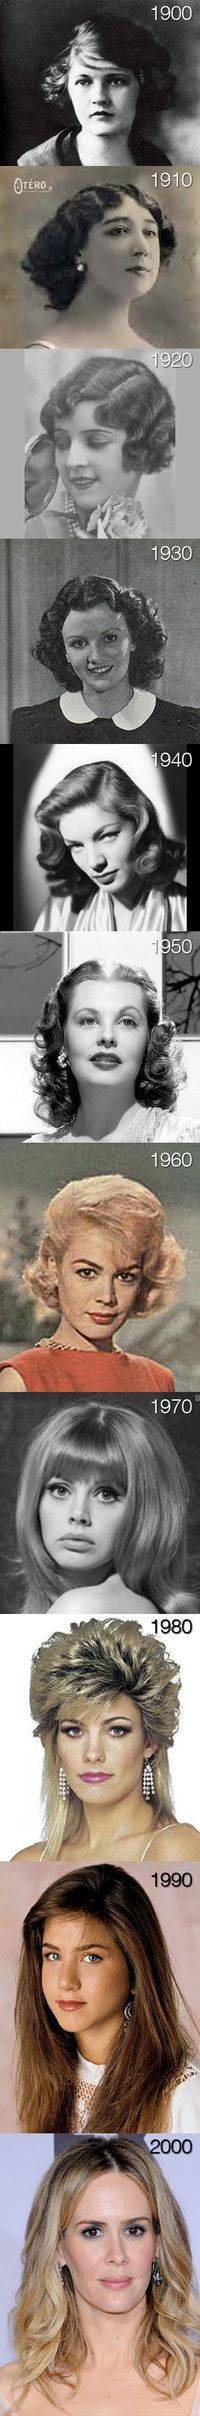 The evolution of hair